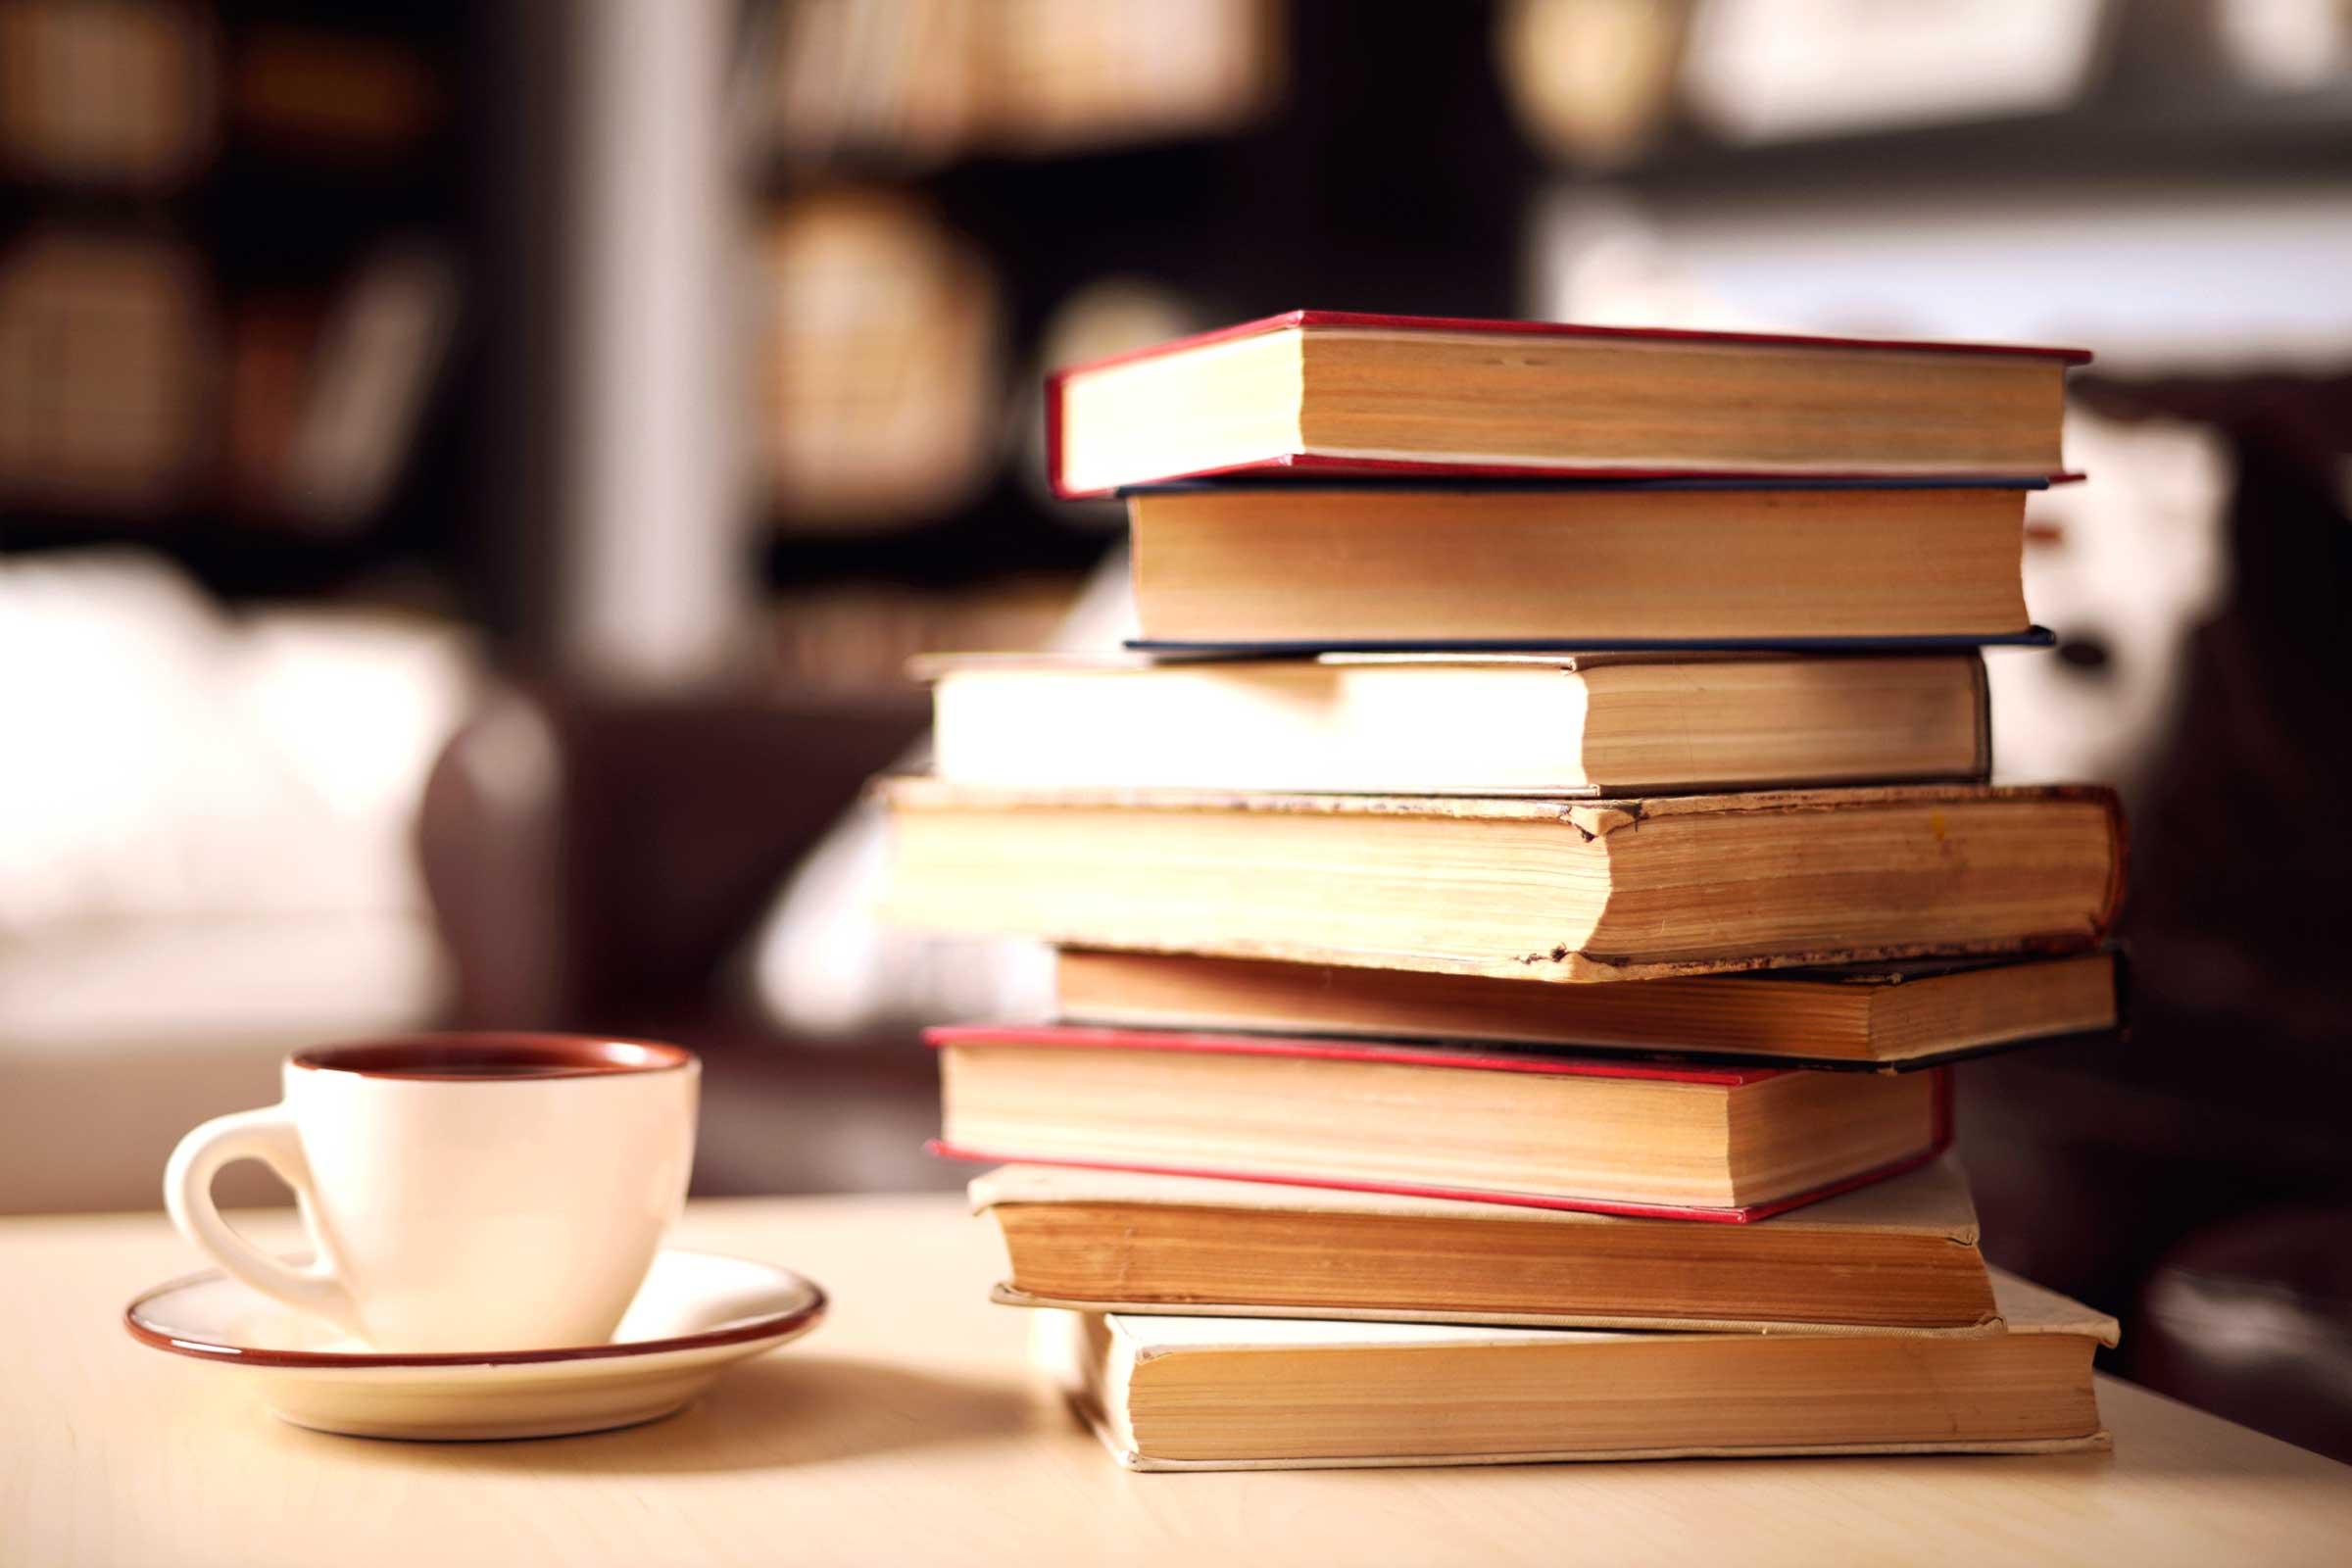 06 reading habits multiple books